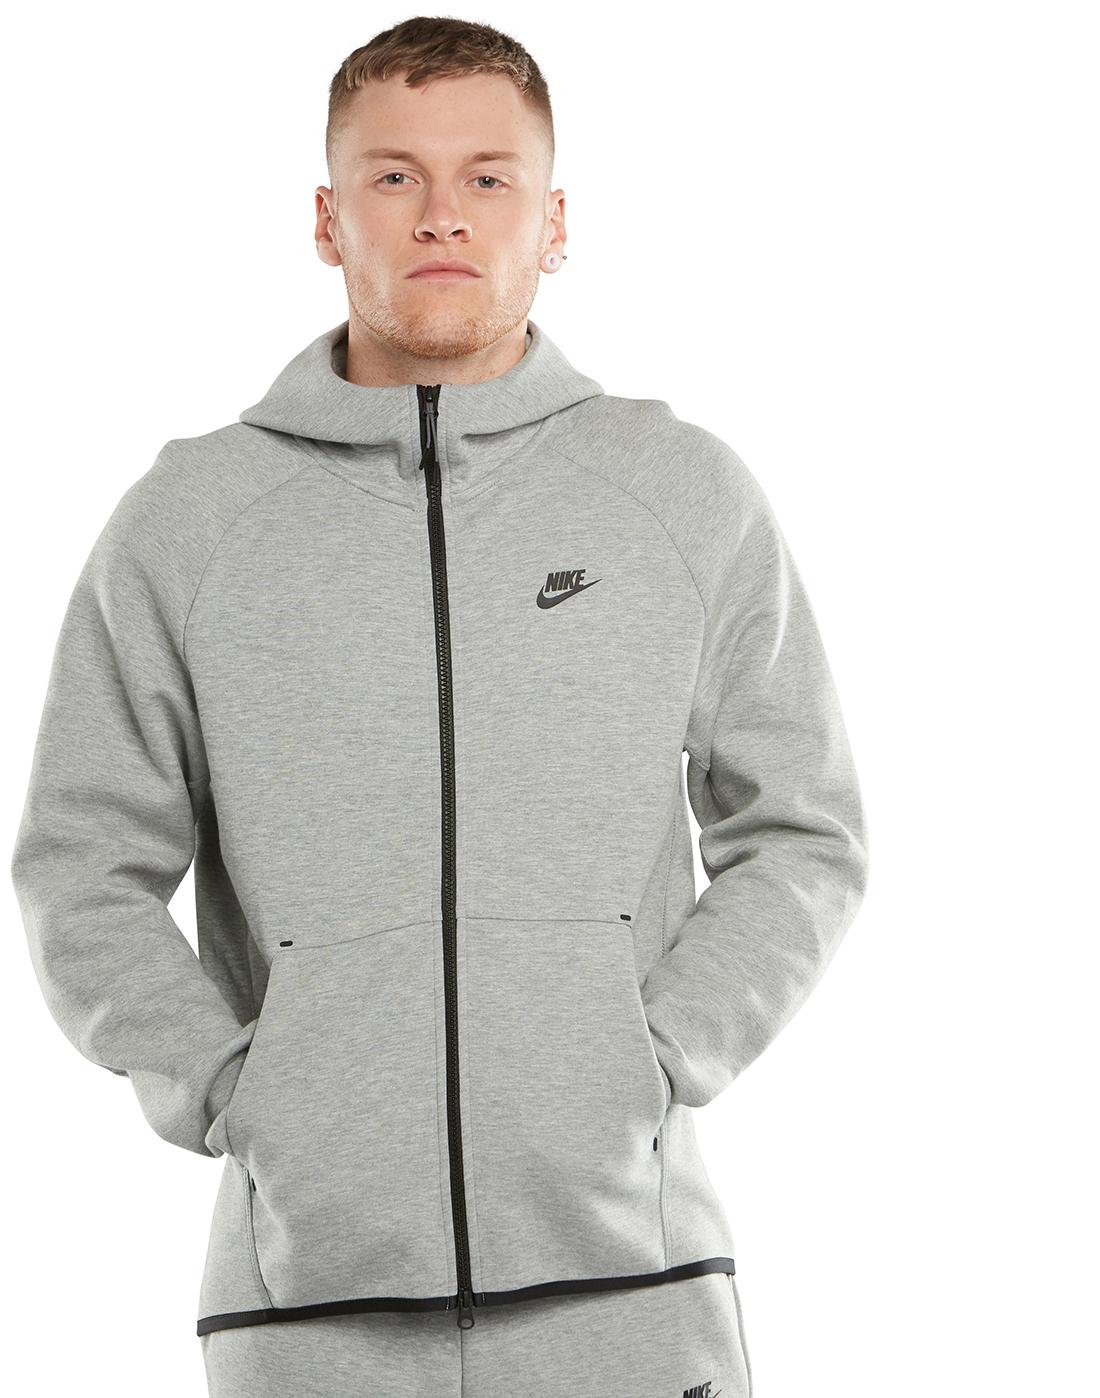 Men S Grey Nike Tech Fleece Hoodie Life Style Sports